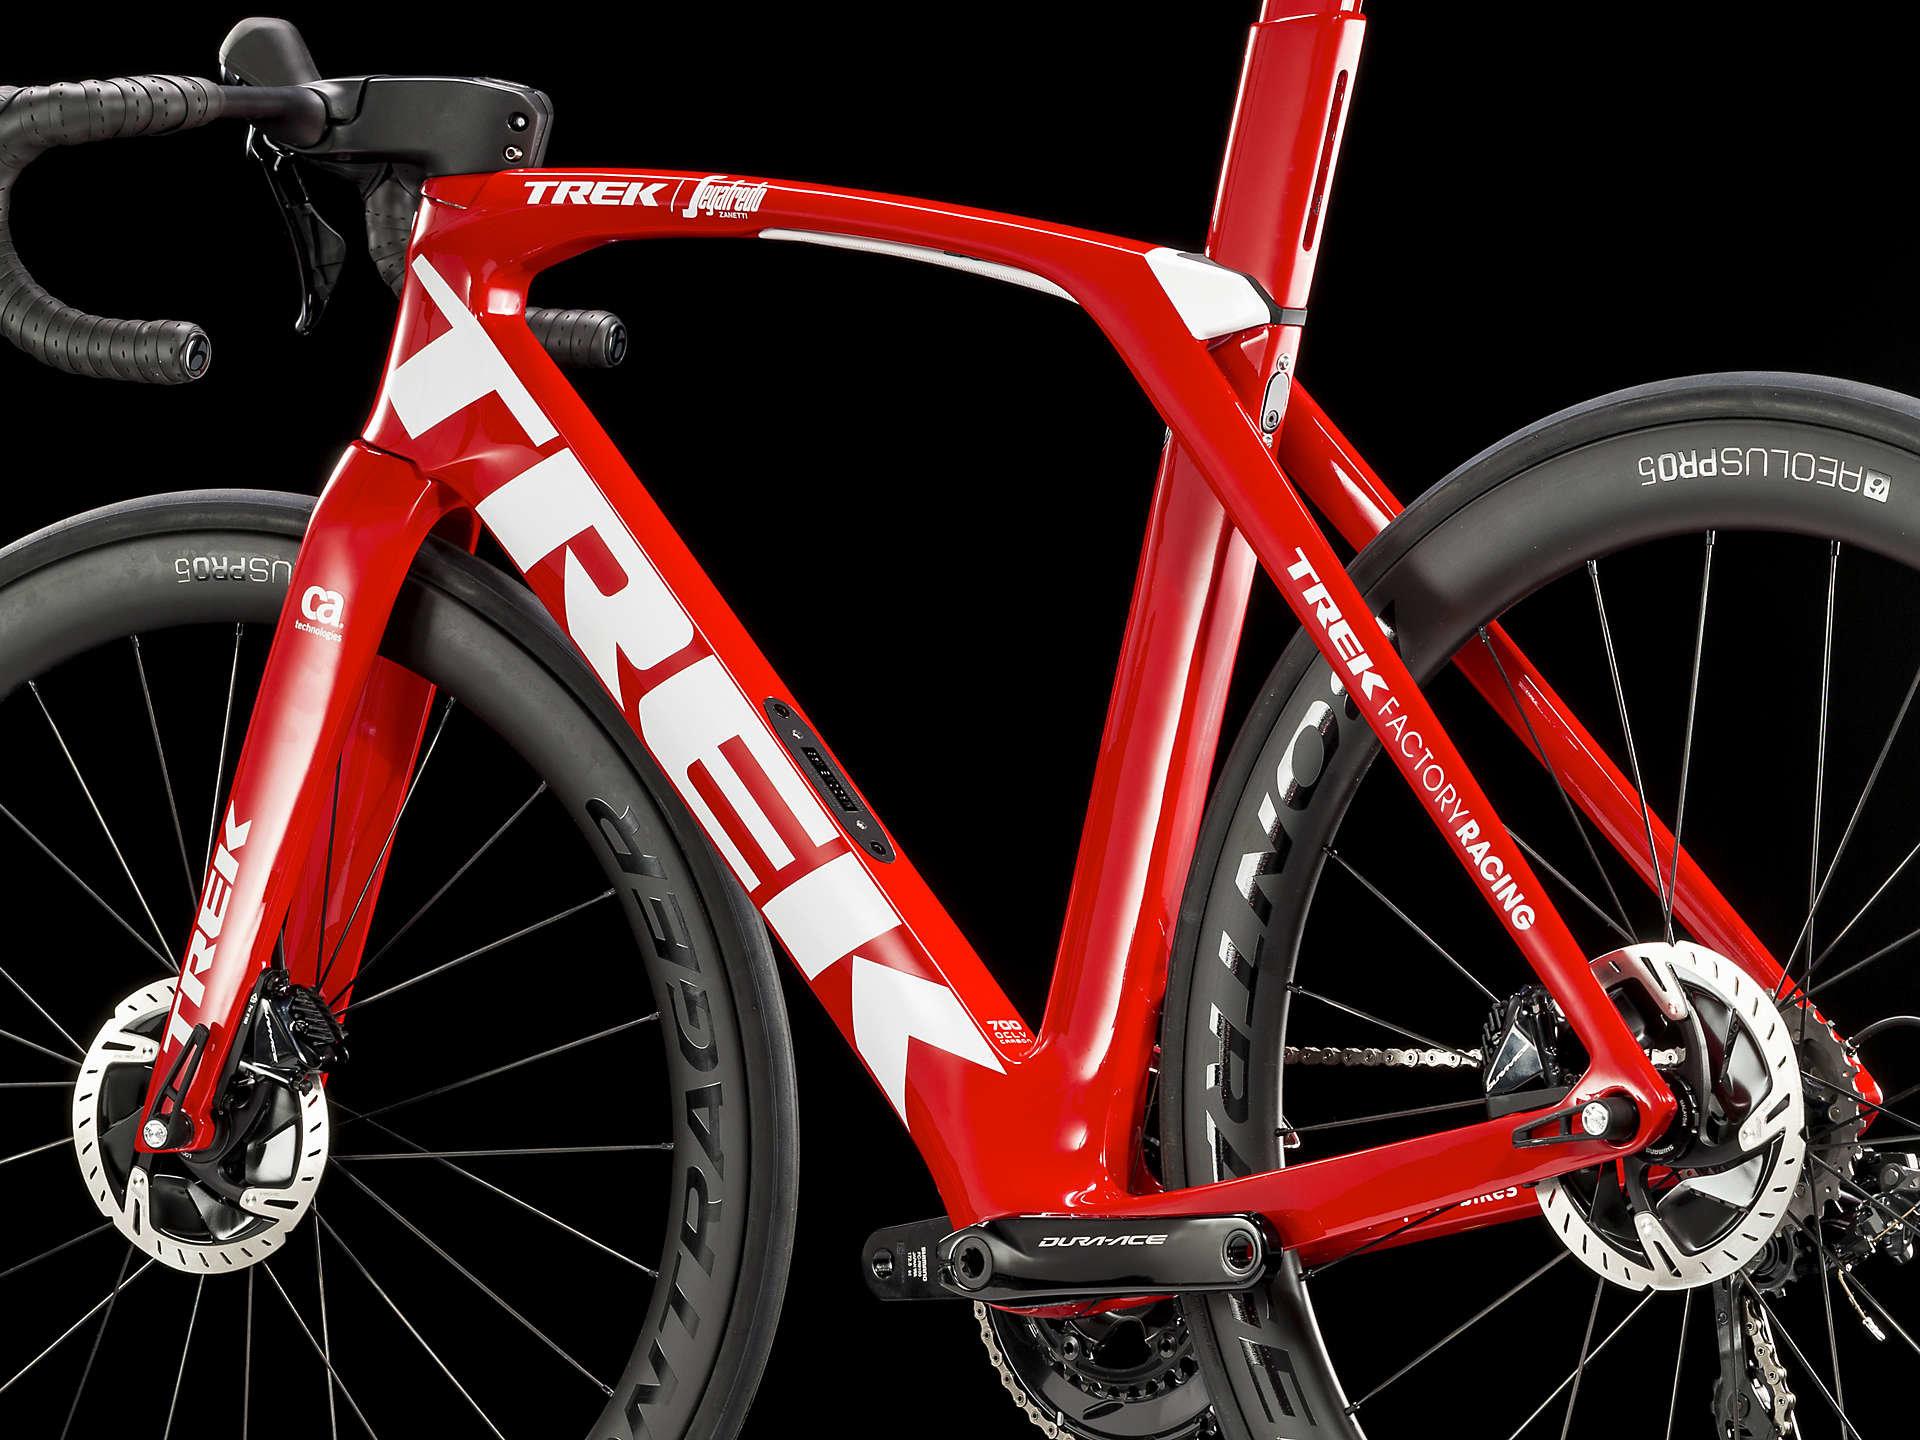 Trek Madone SLR 8 Disc - New York City Bike Shop   Bicycle